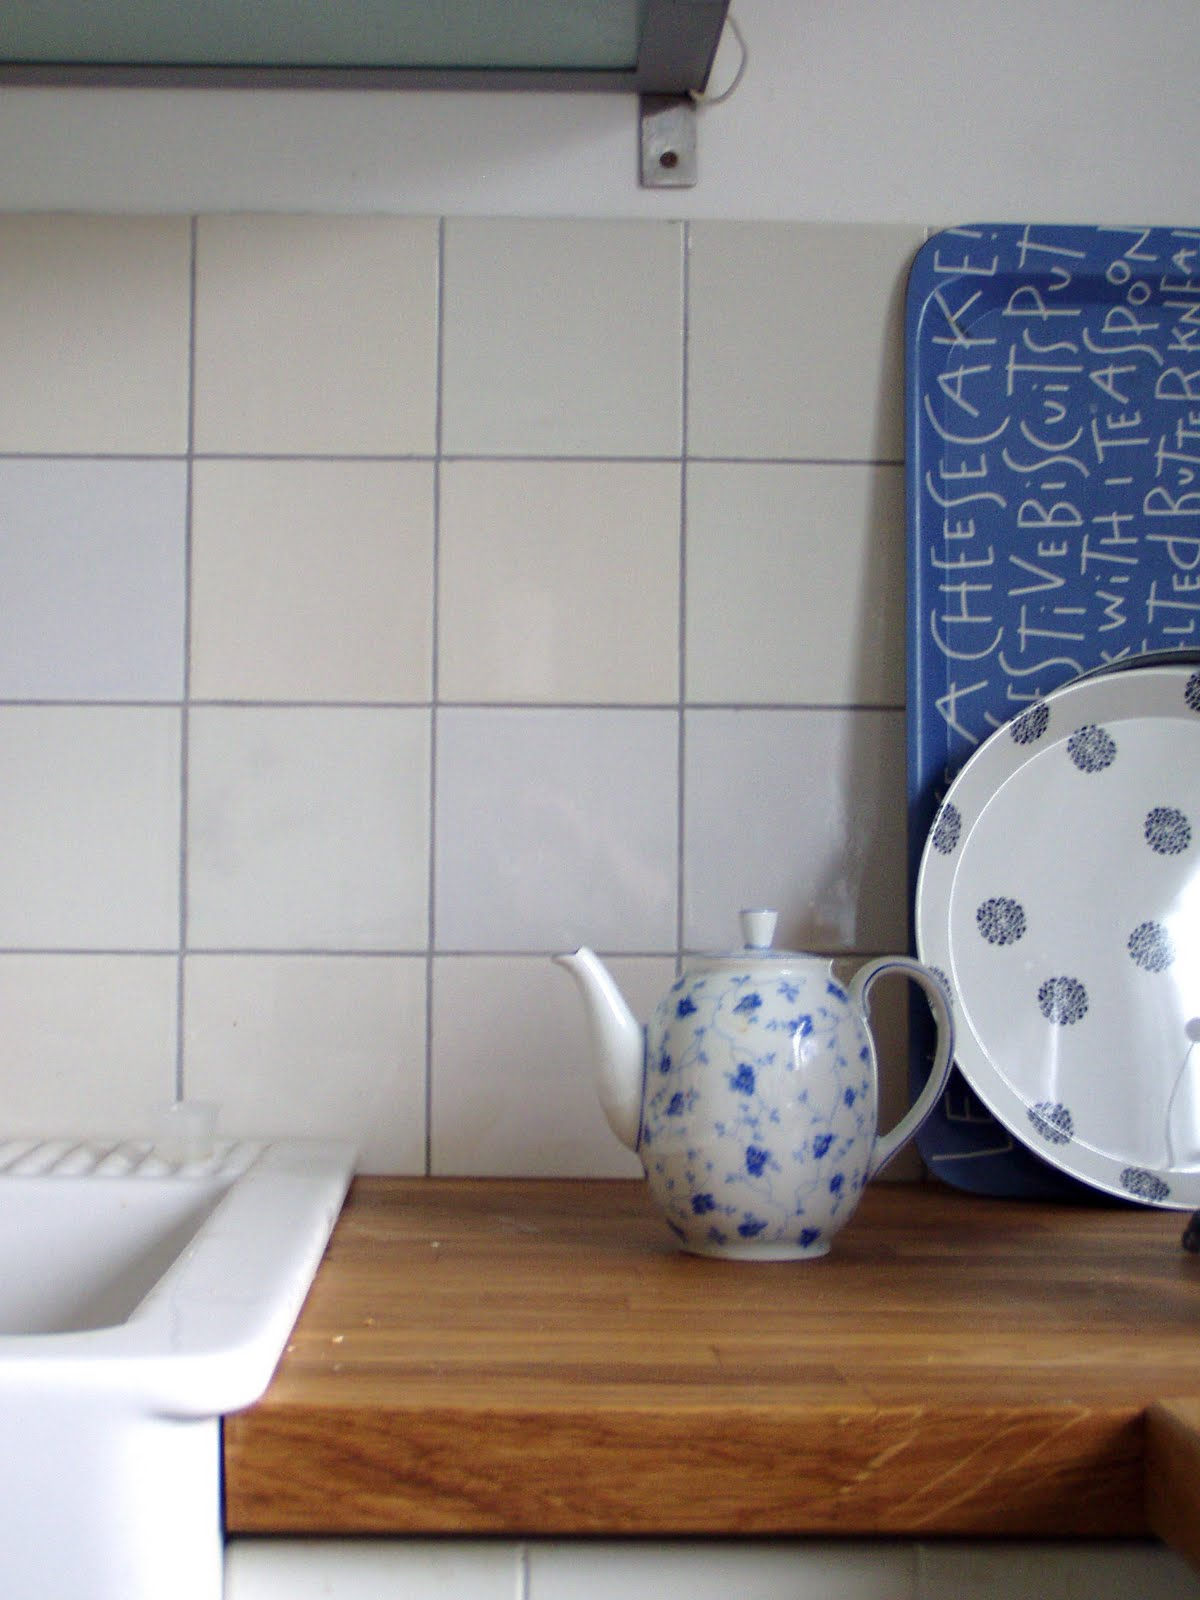 sewing addicted naehsucht unser haus erste eindr cke. Black Bedroom Furniture Sets. Home Design Ideas